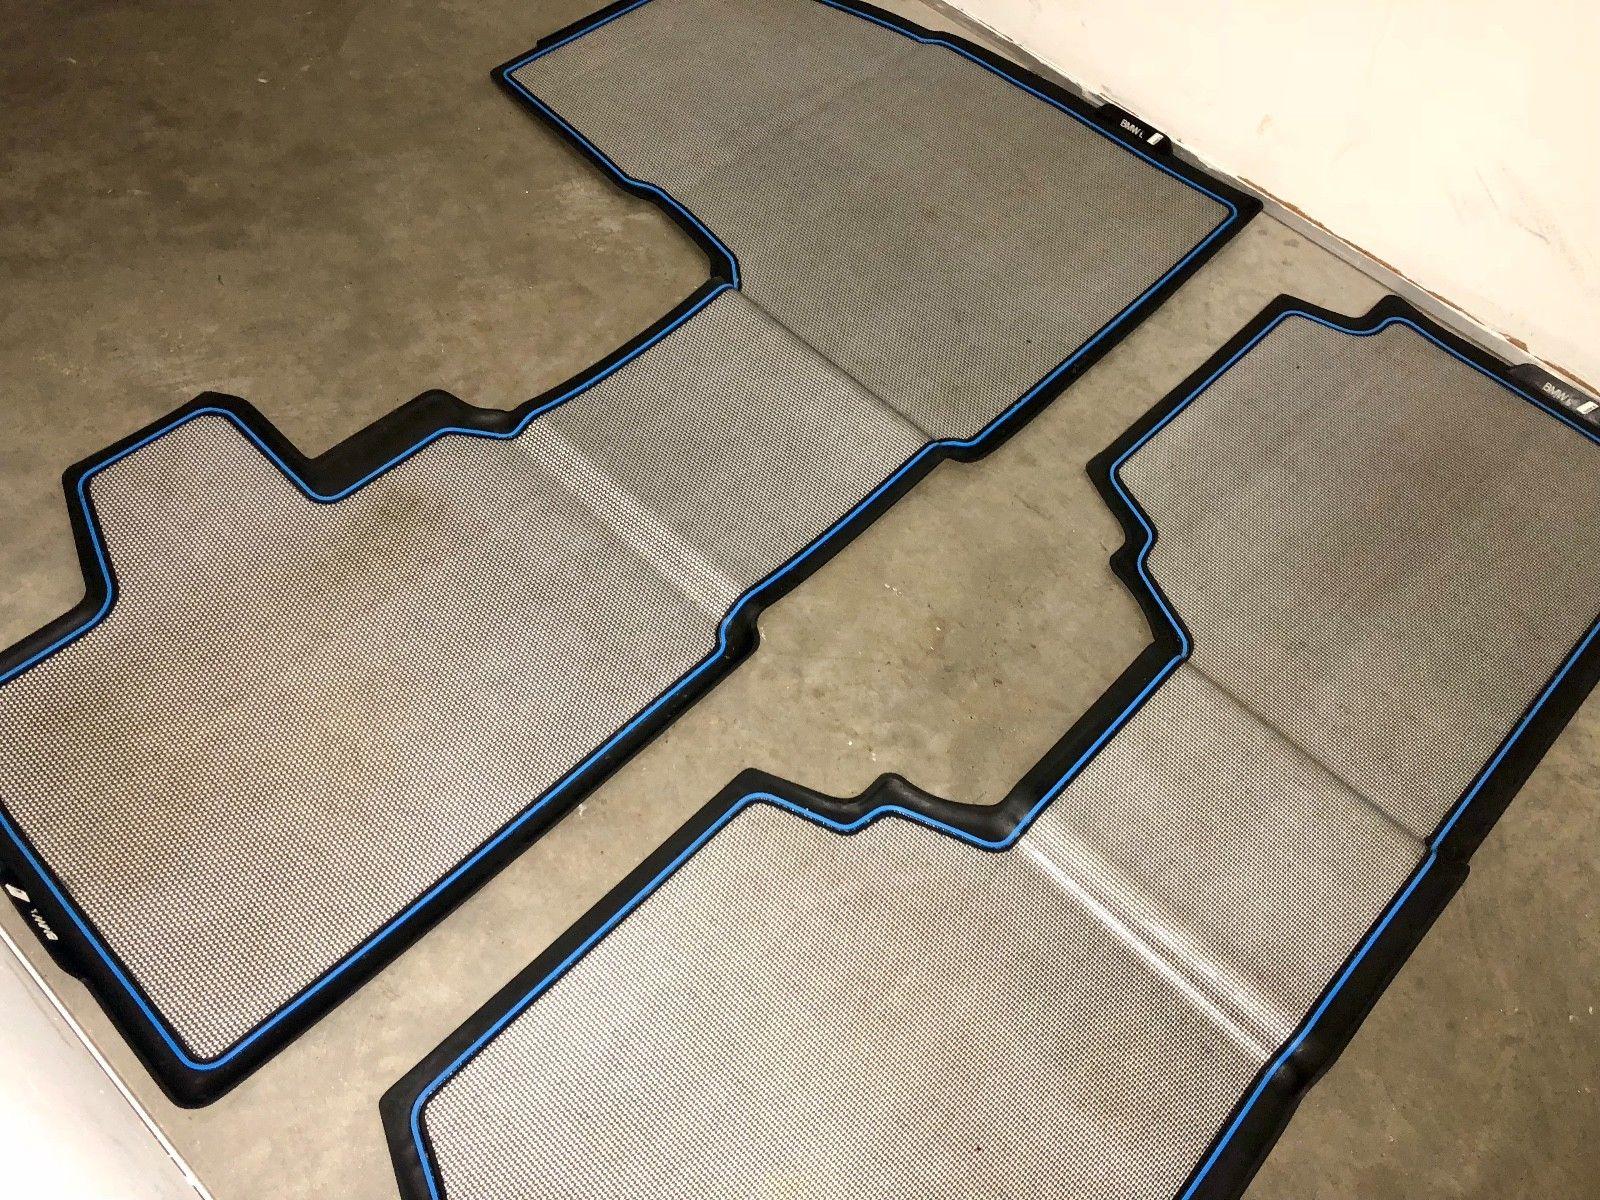 walmart series matsbmw images com size all seriesbmw full weather floor bmw velcrobmw sensational black concept ebay mats carpets of rubber floorats genuine bmwor